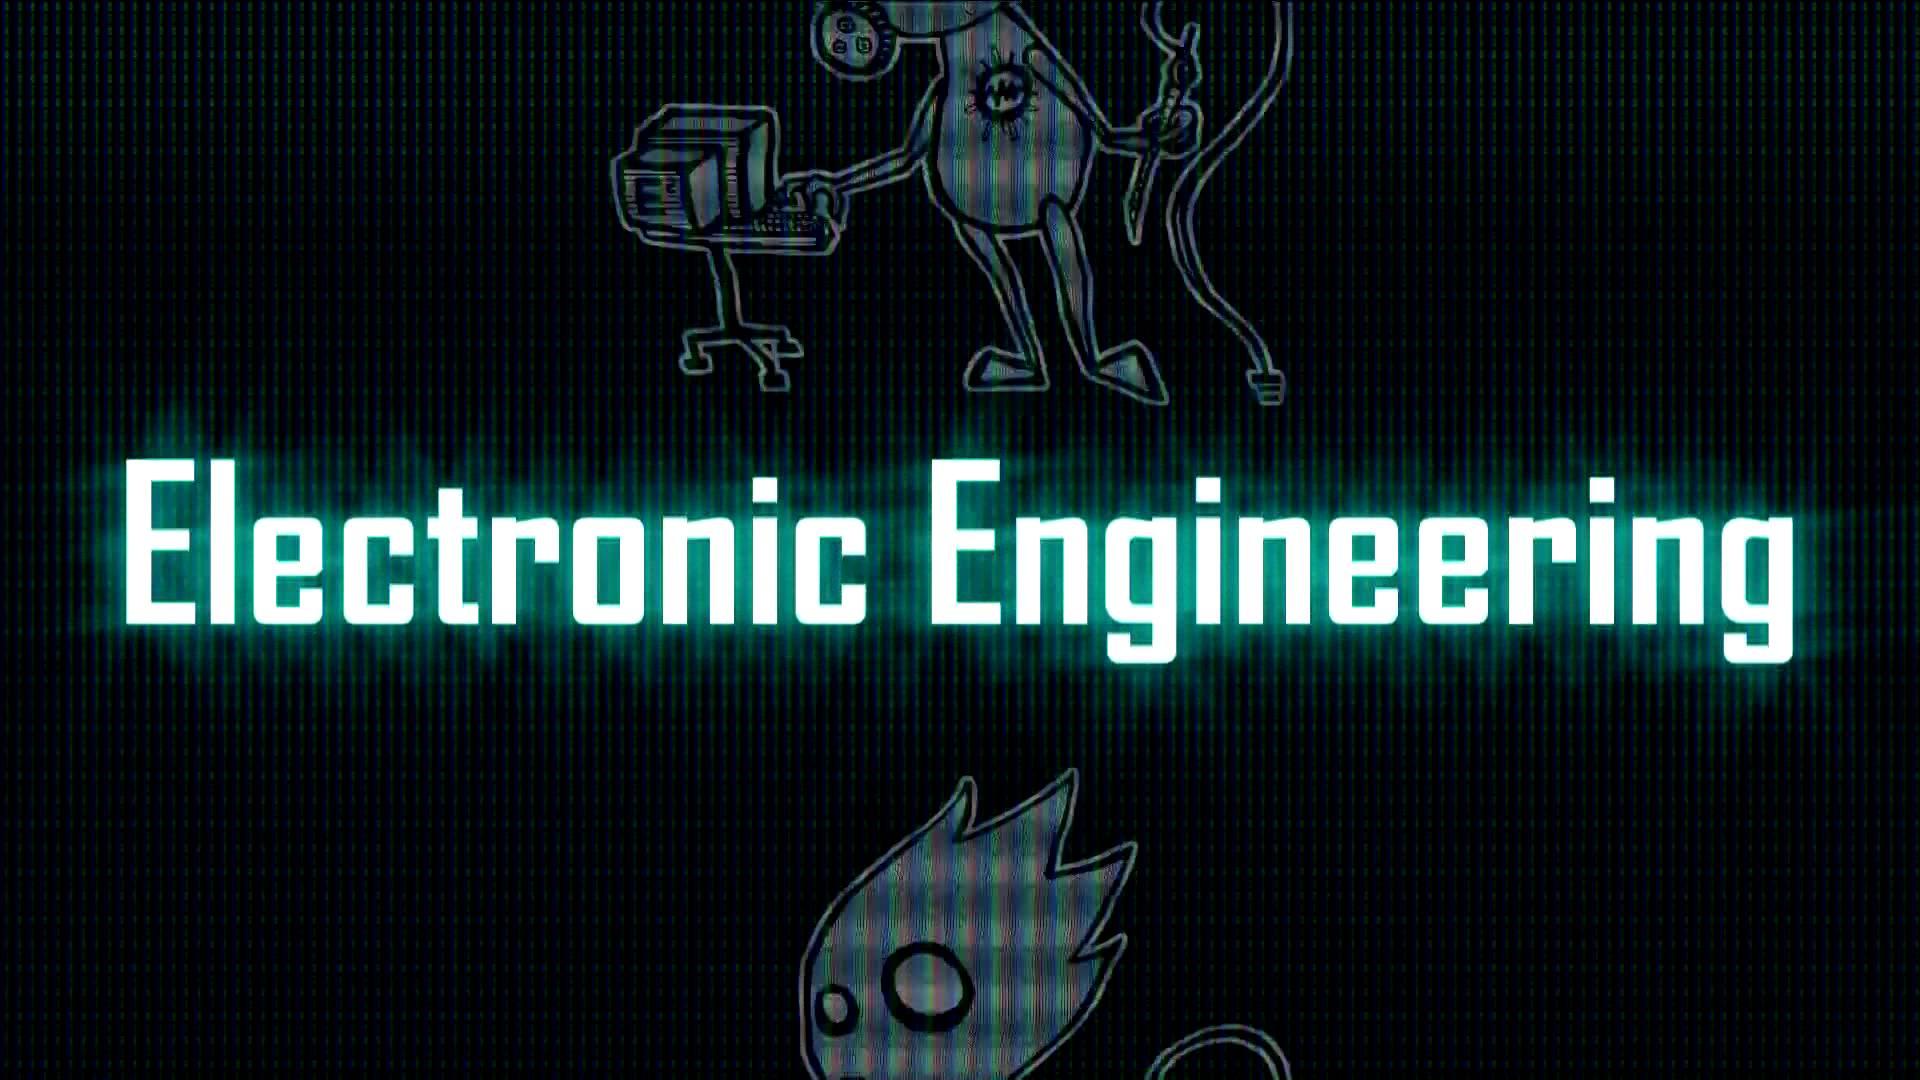 Electronic Engineering Career Jobs in Pakistan Scope Opportunities Salary requirements